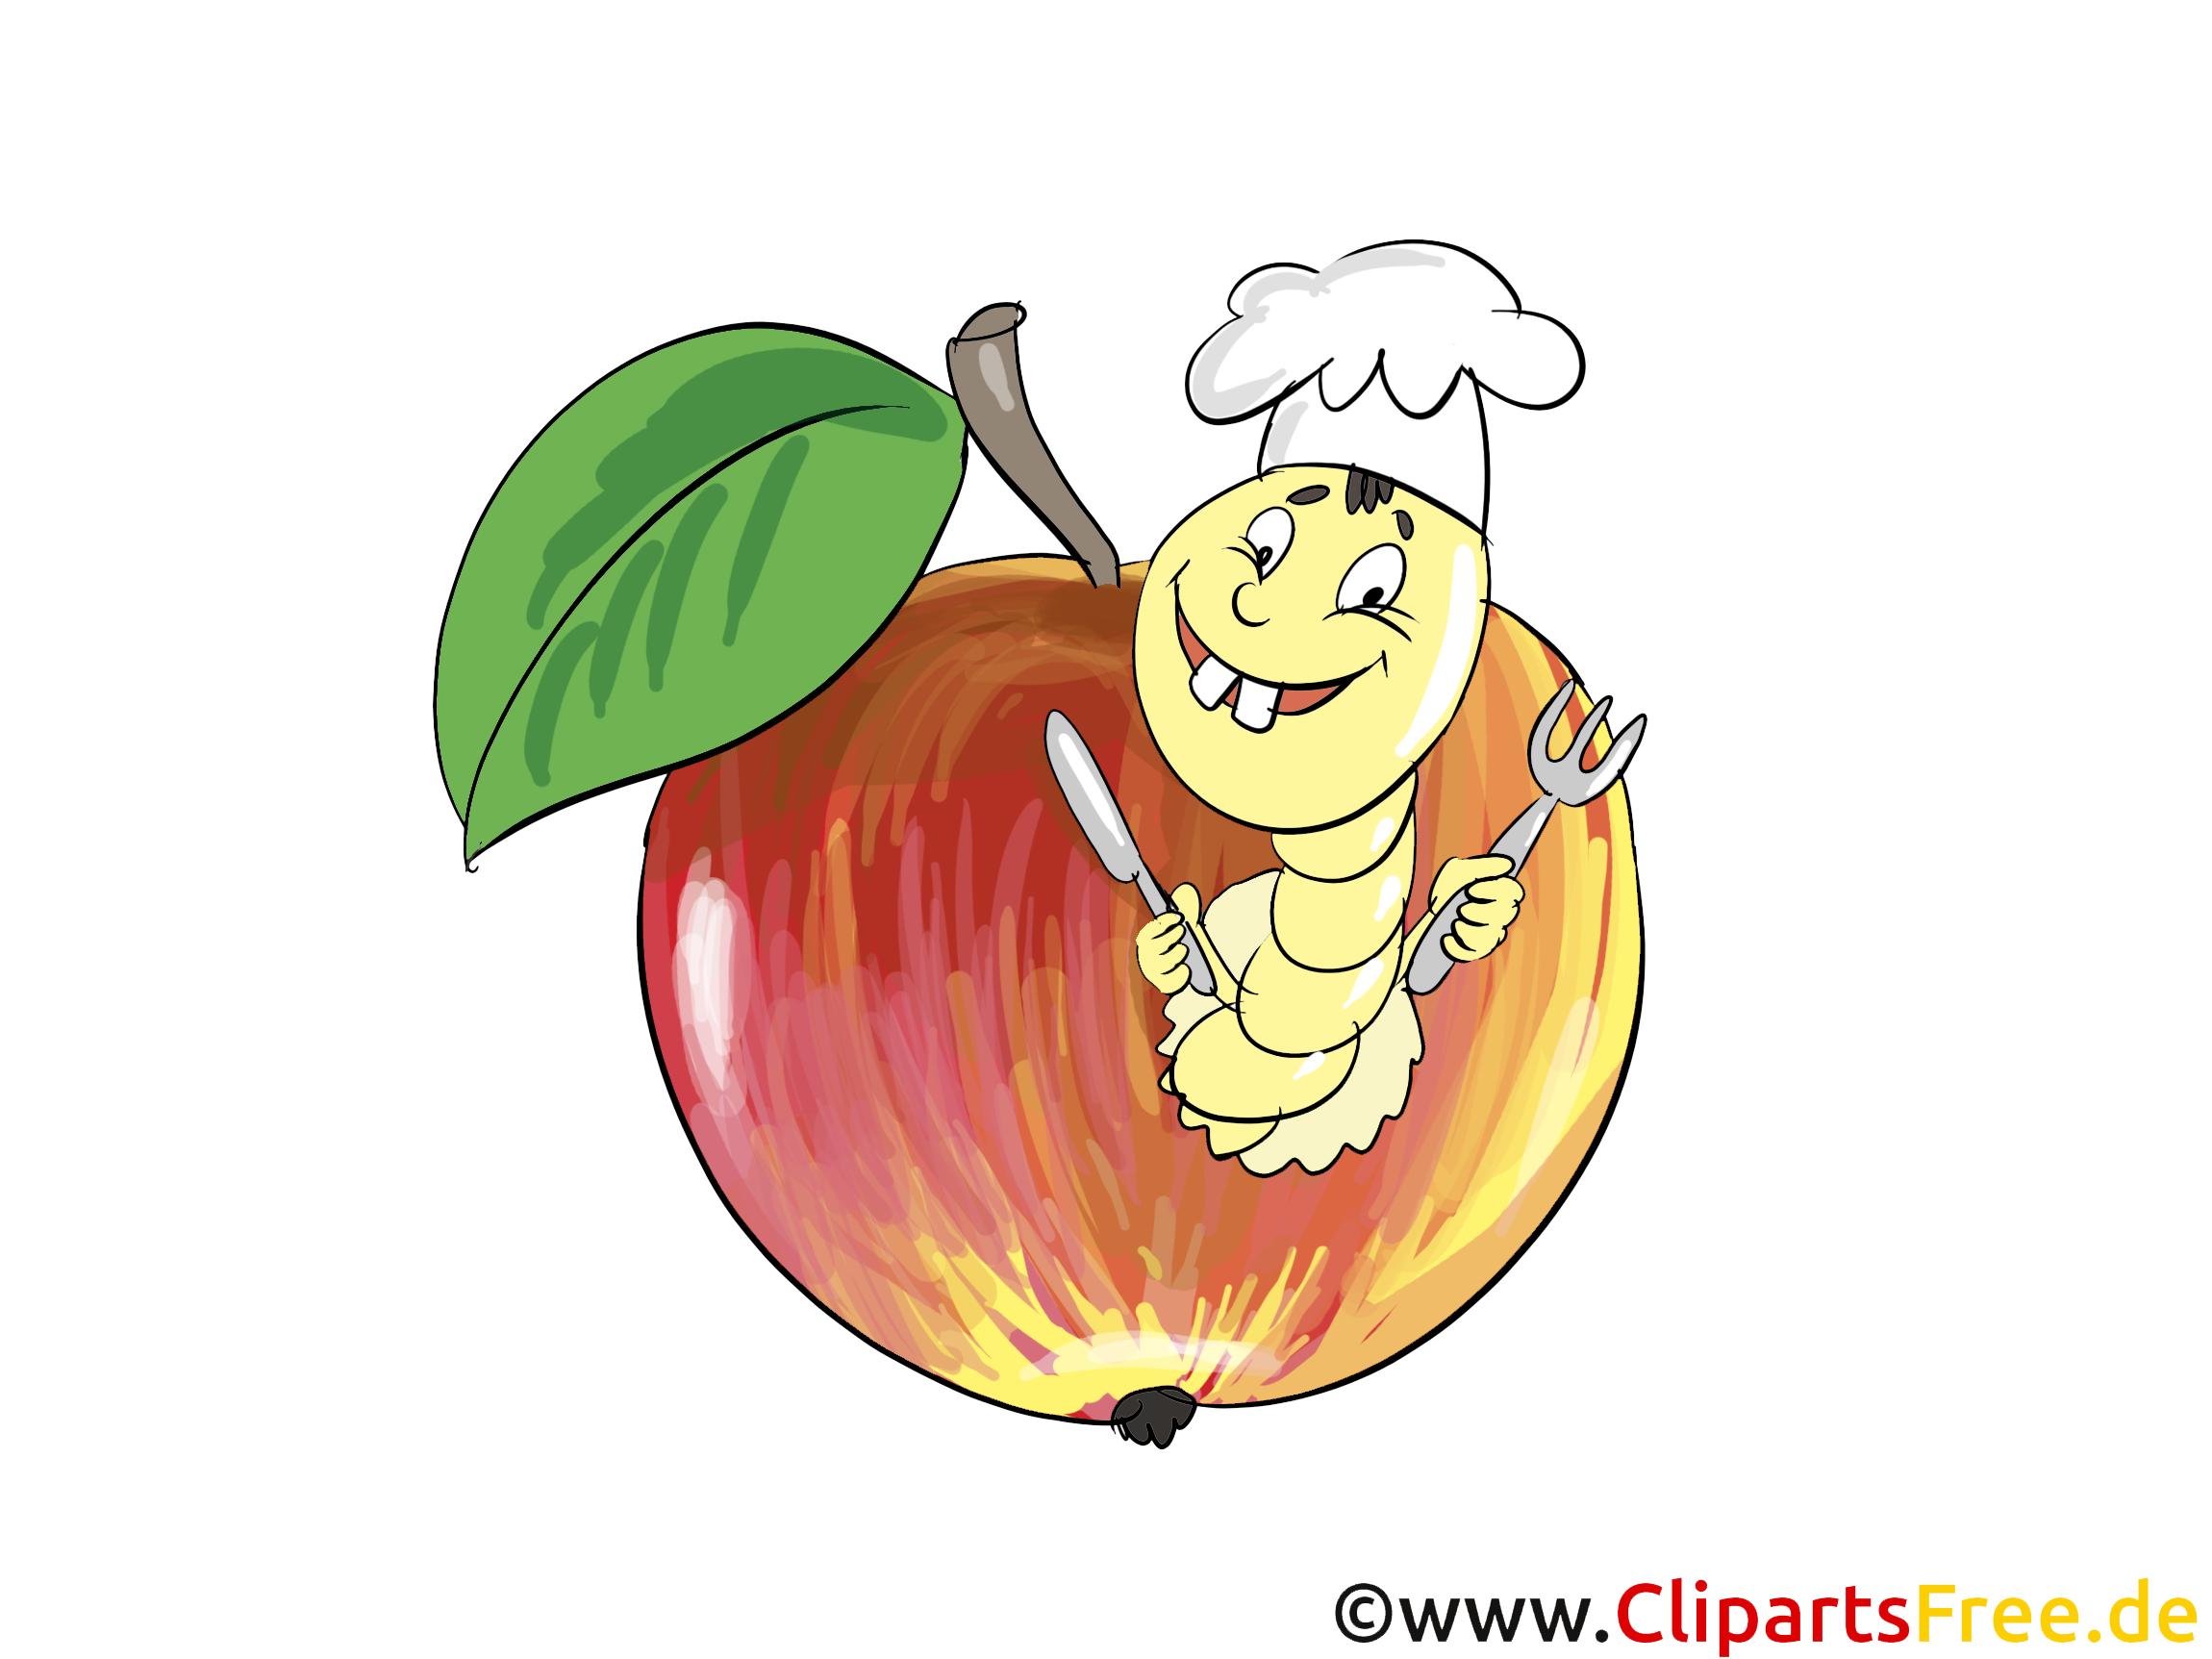 Wurm im Apfel Clipart, Comic, Bild, Illustration